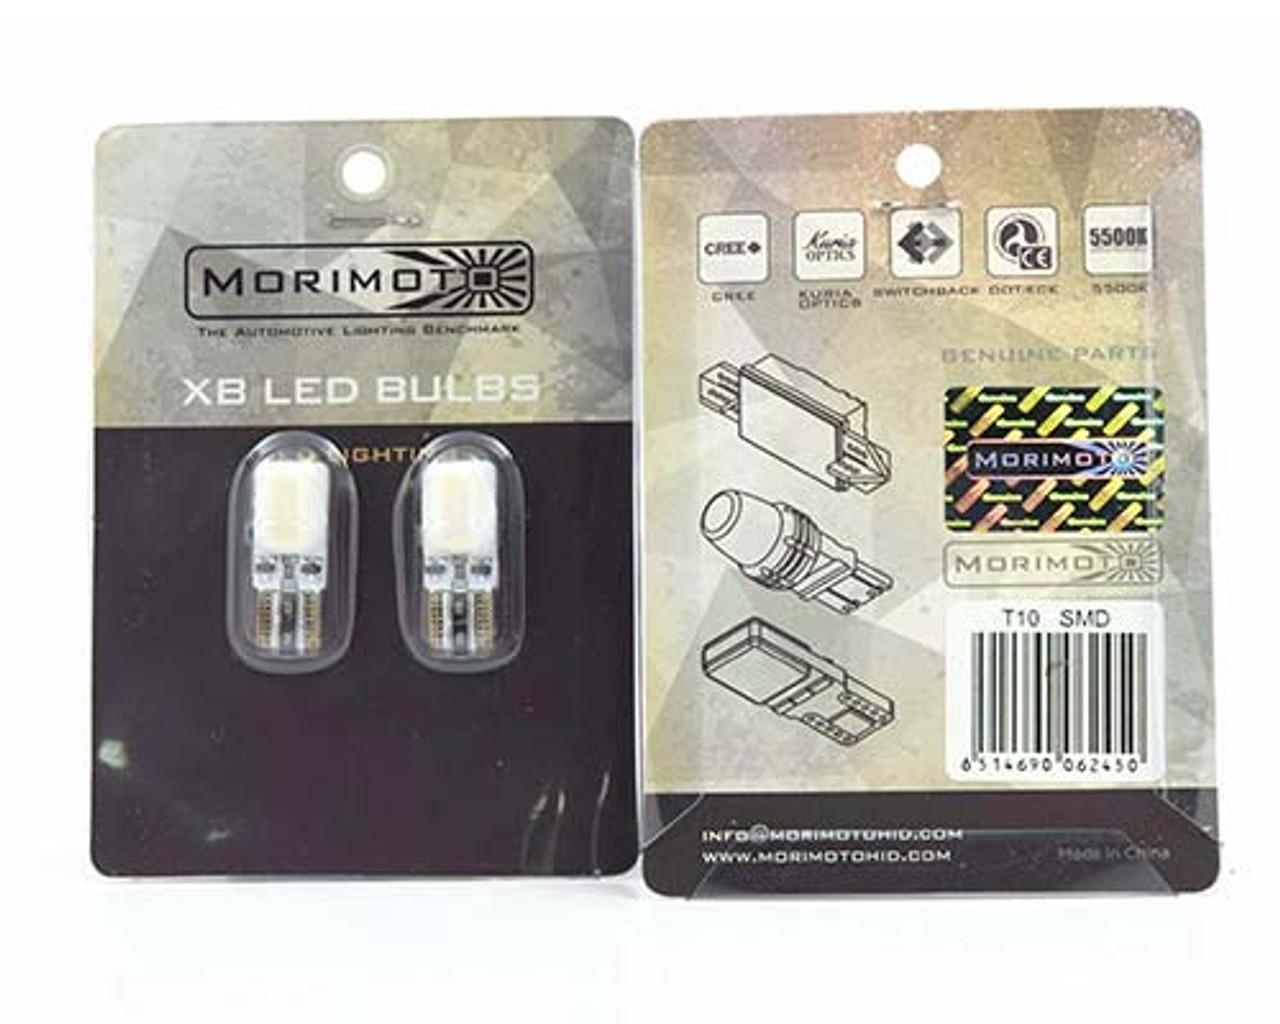 Morimoto 194/T10 LED Wedge Bulbs Pair  (White 5500K)